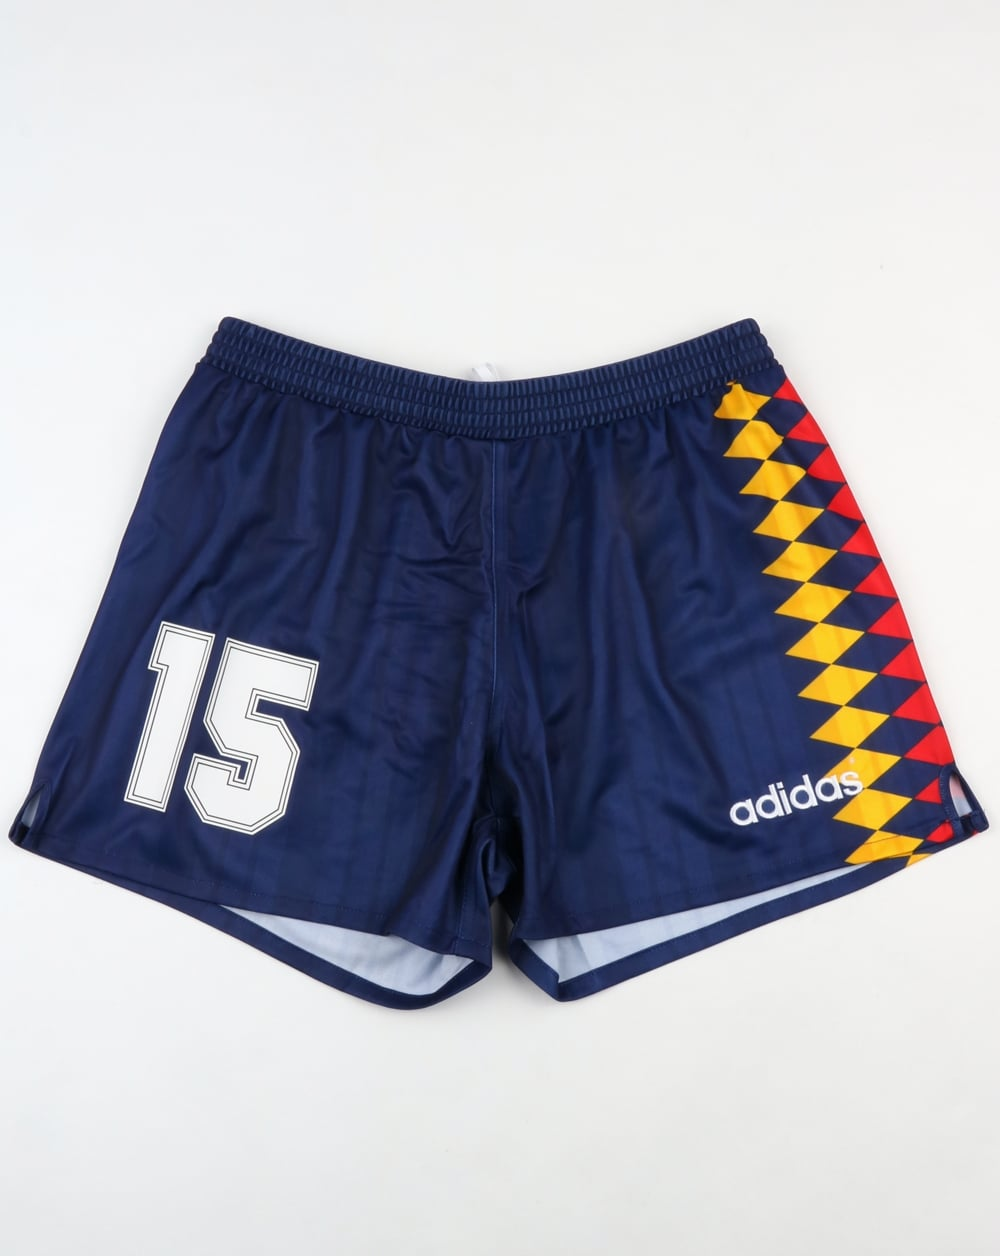 Shuraba Afectar Dedicar  Adidas Originals Spain Shorts Unity Ink,football,retro,mens